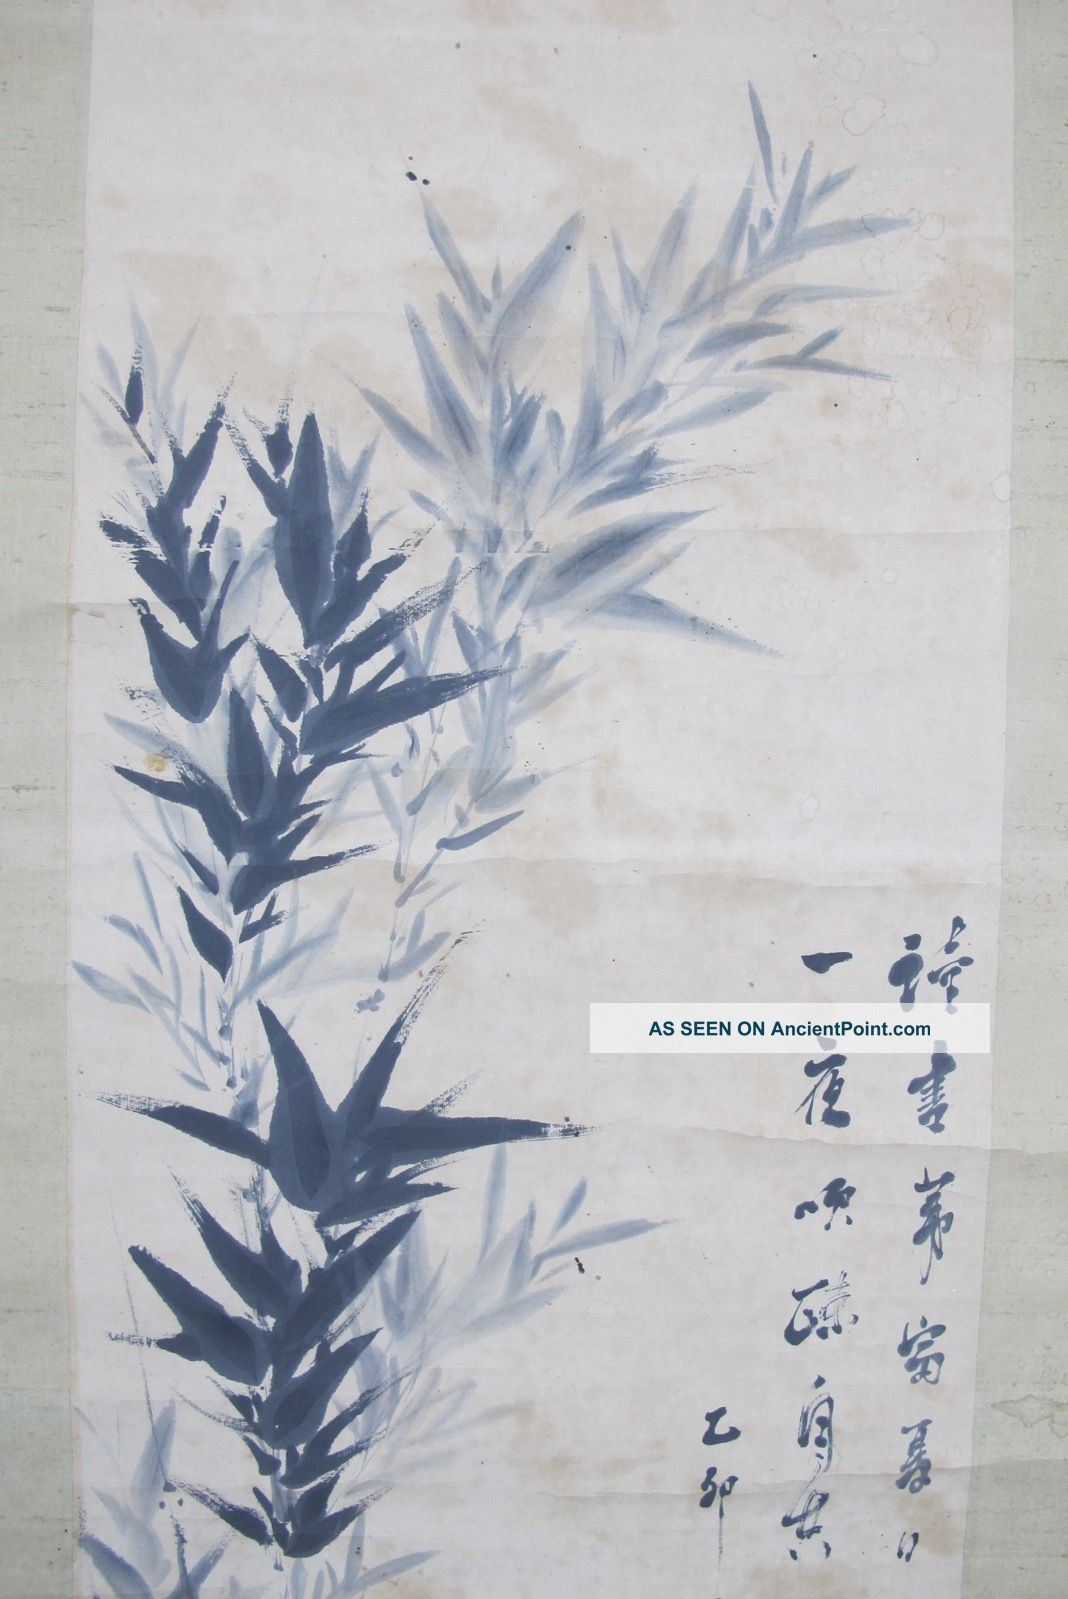 Sc189 Japanese Hanging Scroll Signature Calligraphy Sumie Bamboo Vtg Kakejiku Paintings & Scrolls photo